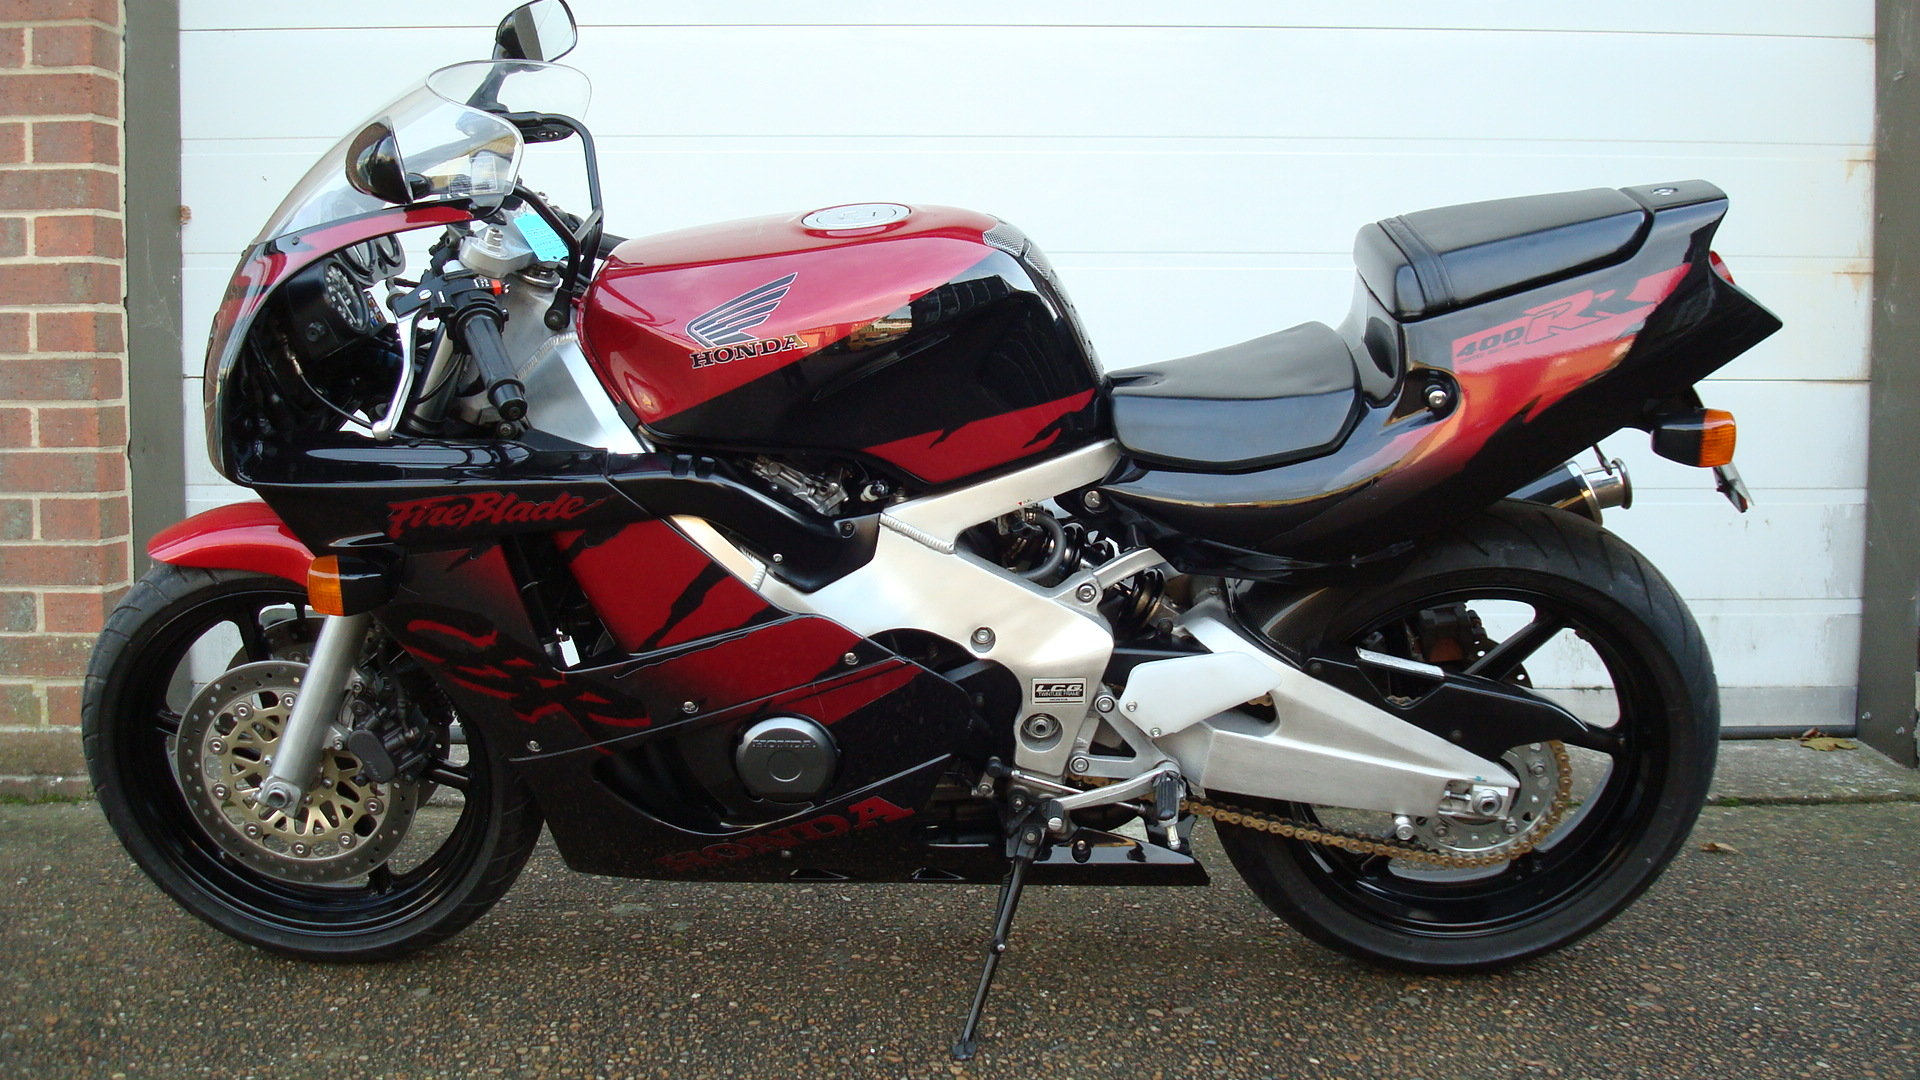 Honda CBR400 RR-R 1998-R **LOW KMS,EXCELLENT CONDITION** For Sale (picture 6 of 6)